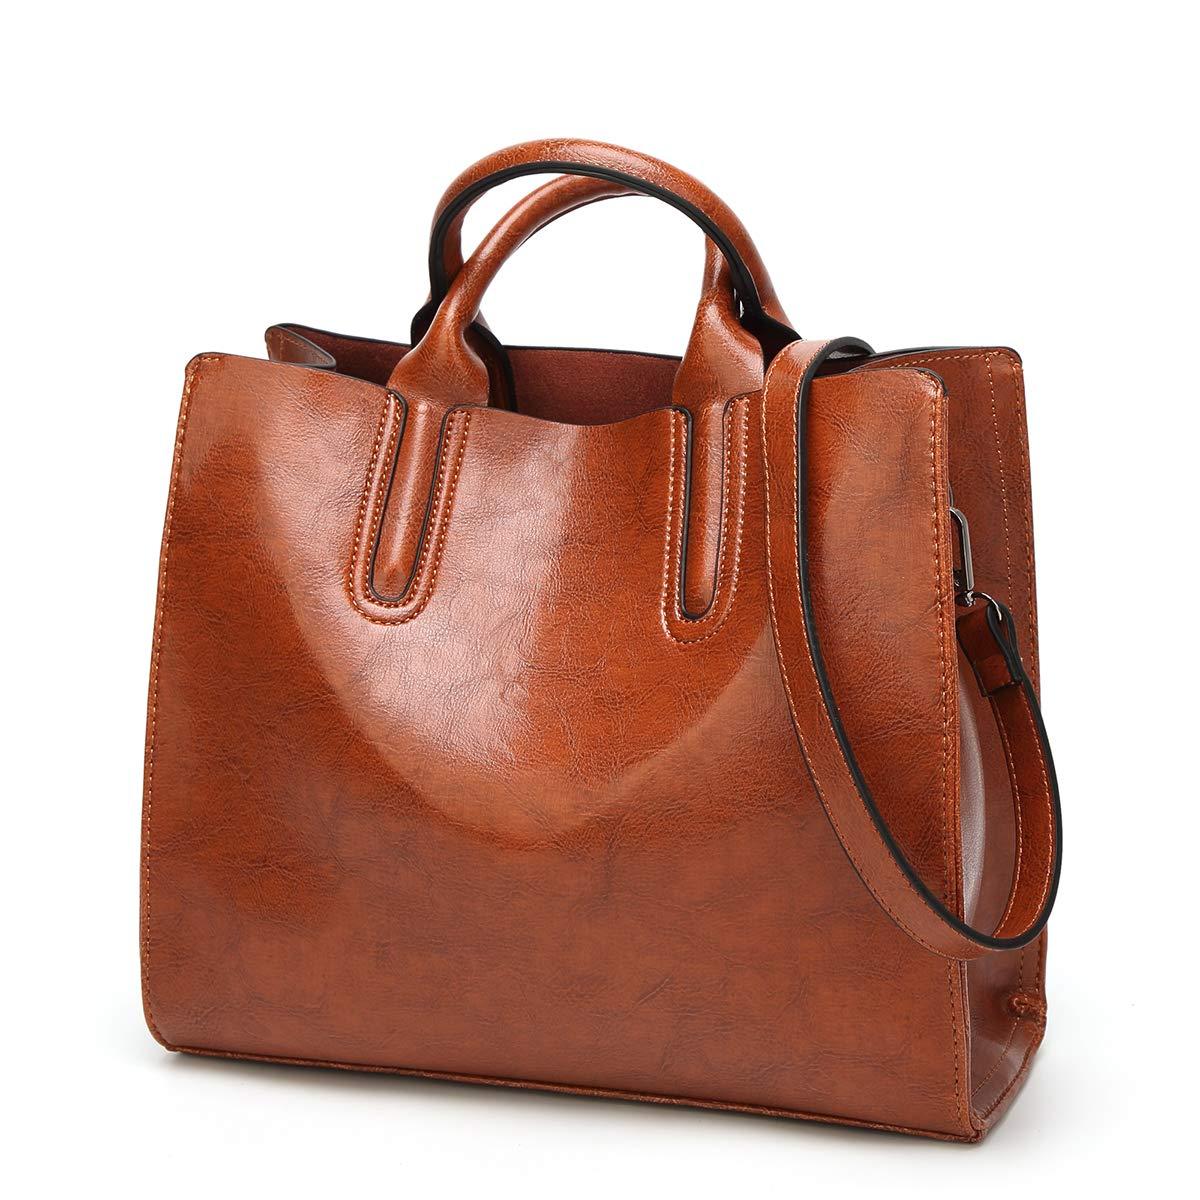 Women Top Handle Satchel Handbags Shoulder Bag Purse Messenger Tote Bag QIN LX (brown)